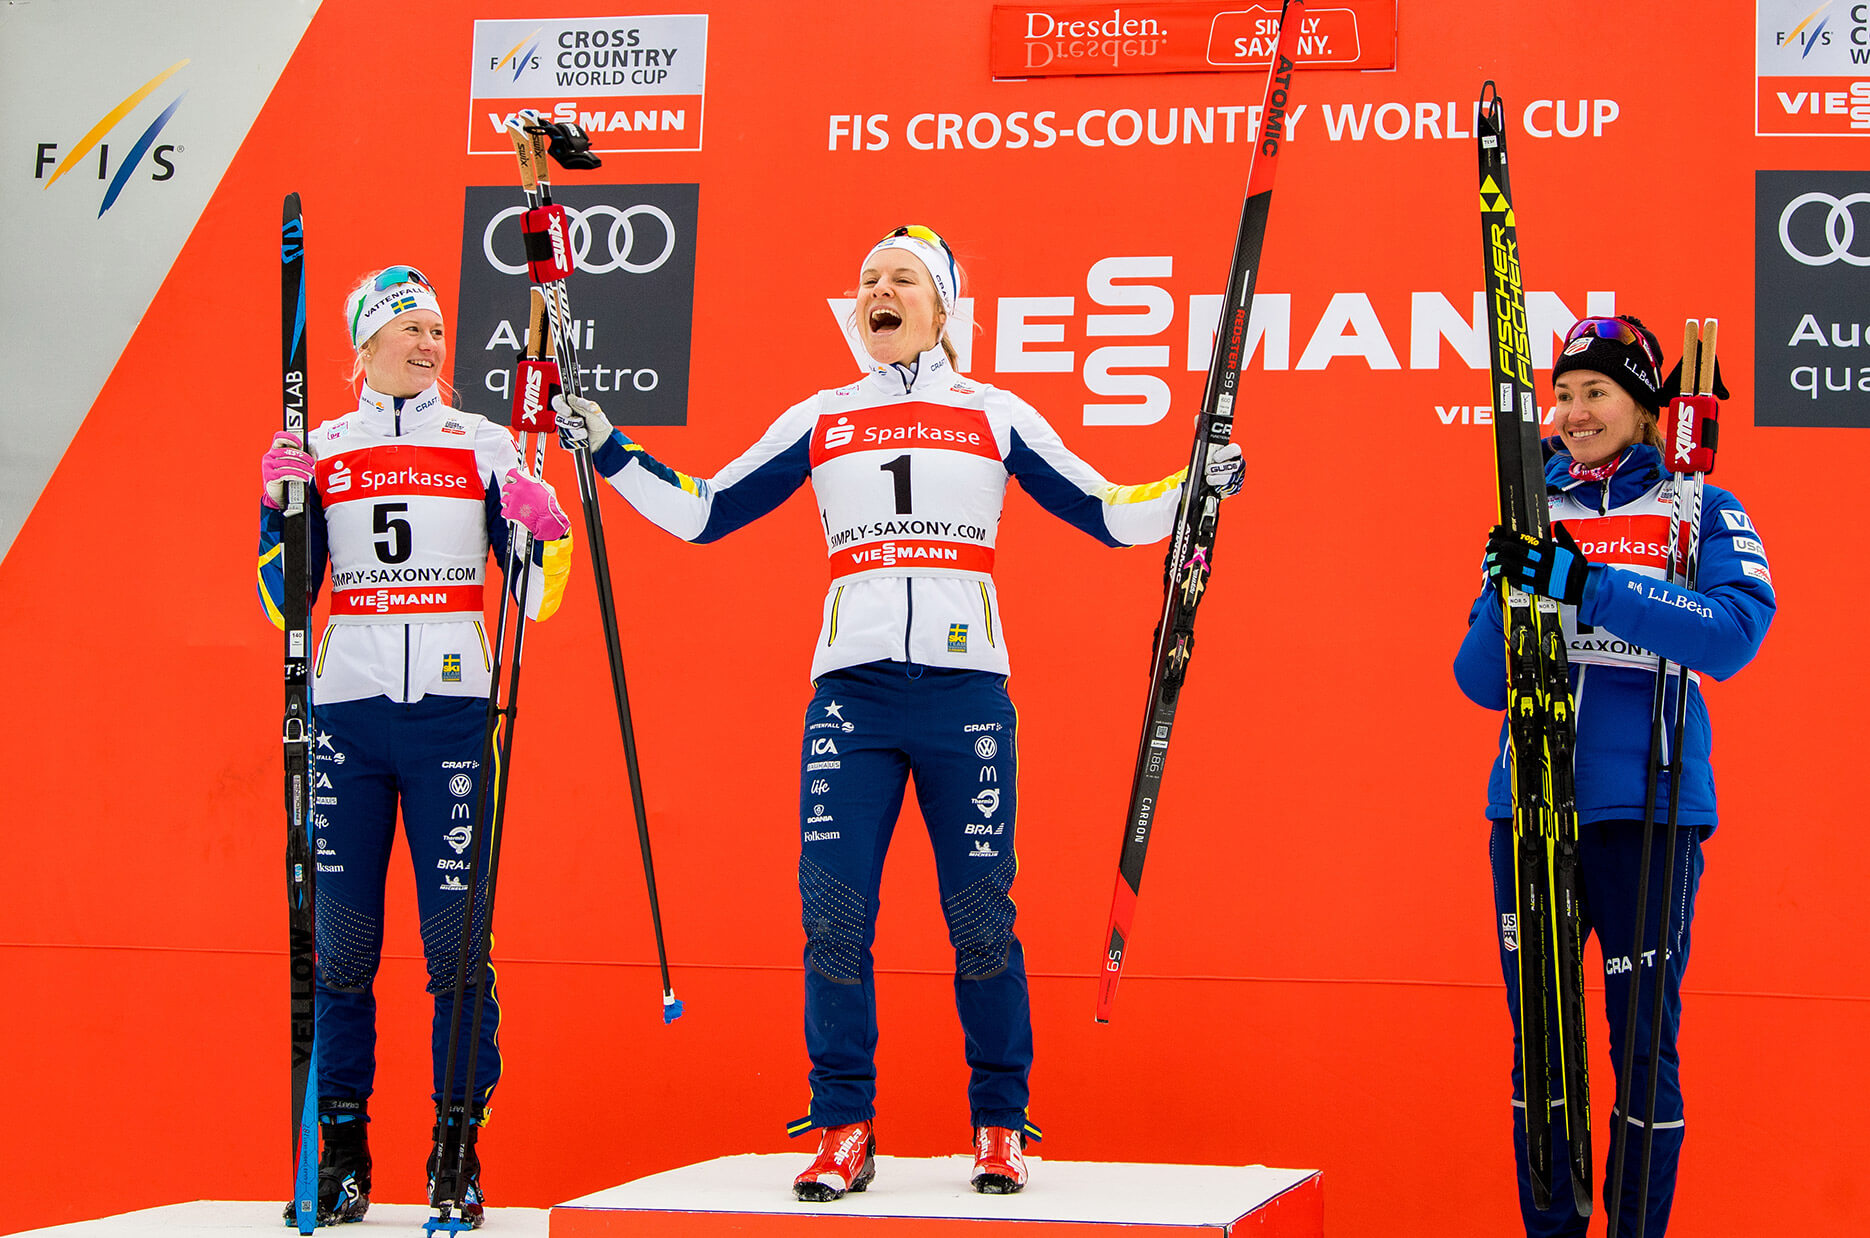 Hanna Falk vinner i Dresden